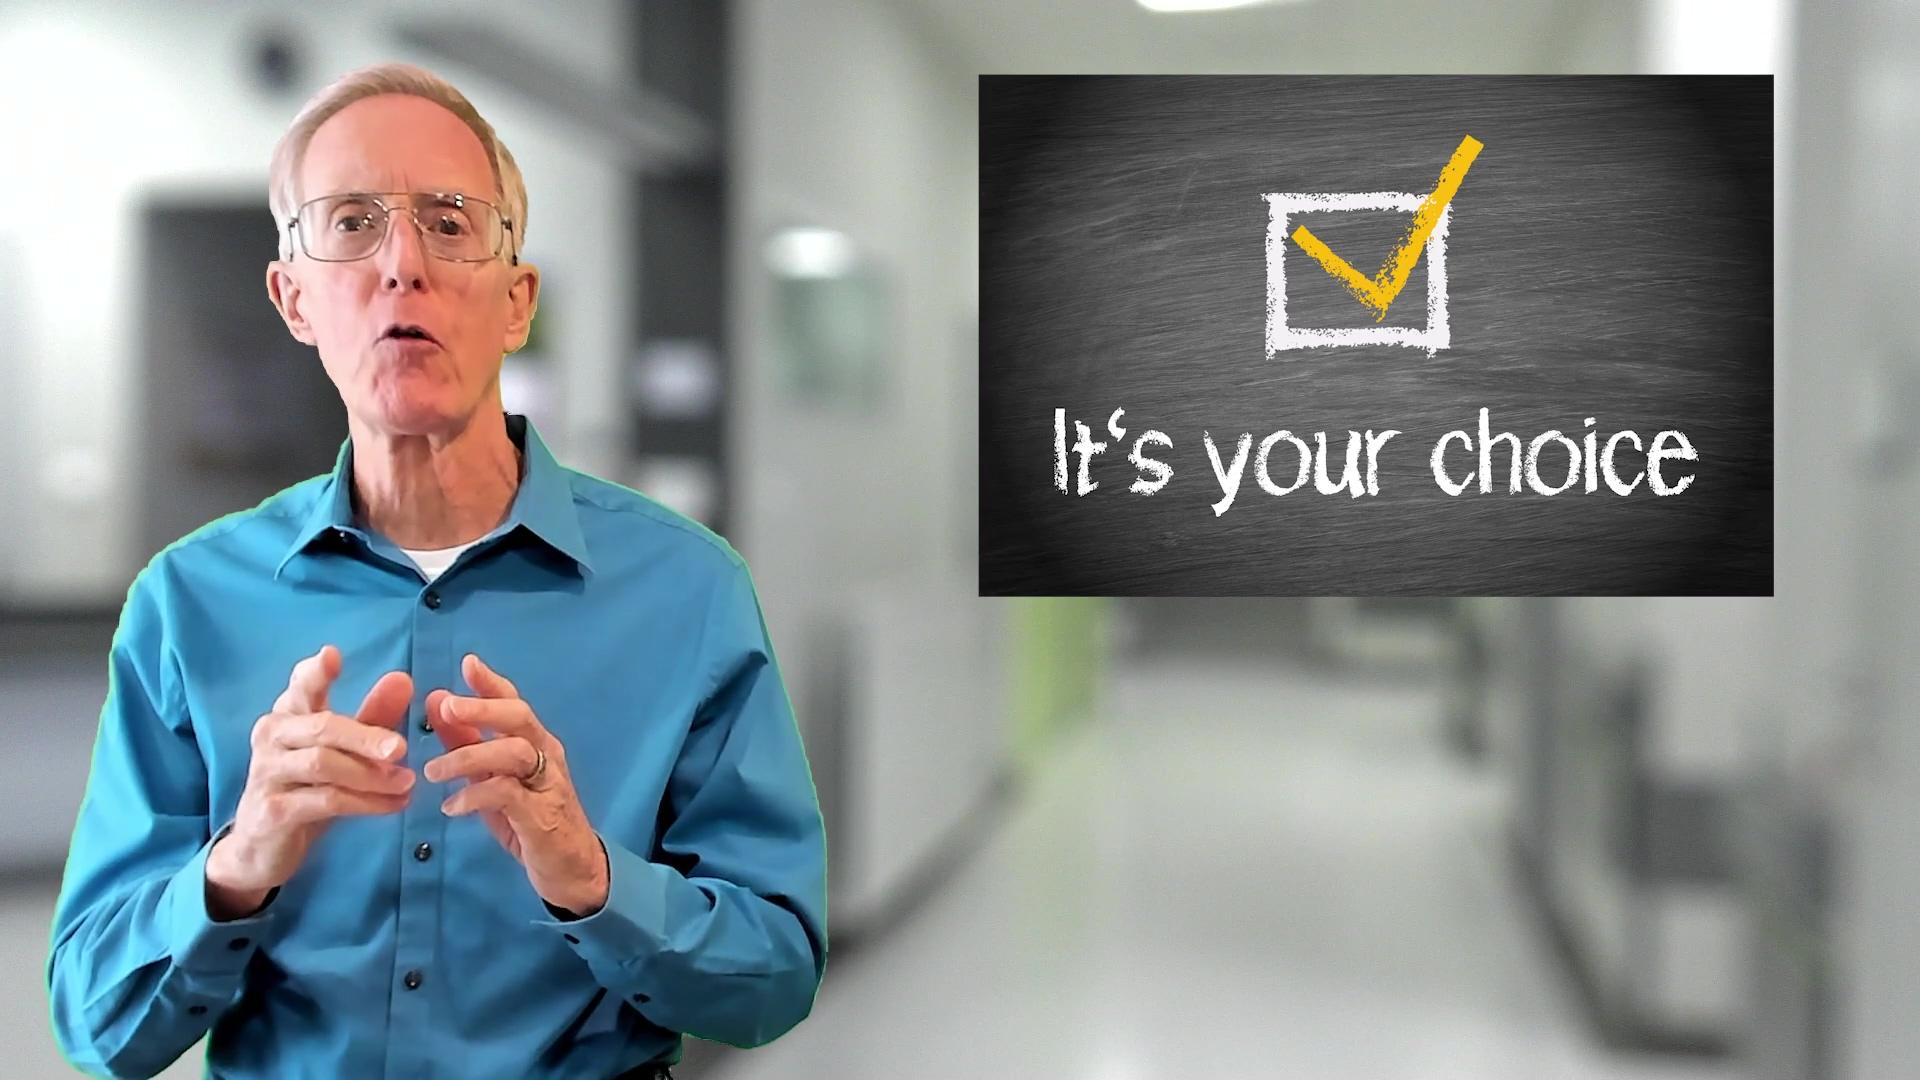 Lifeblood Foundation Kidney Disease Education - Introduction to Modalities Educational Video (IX 202